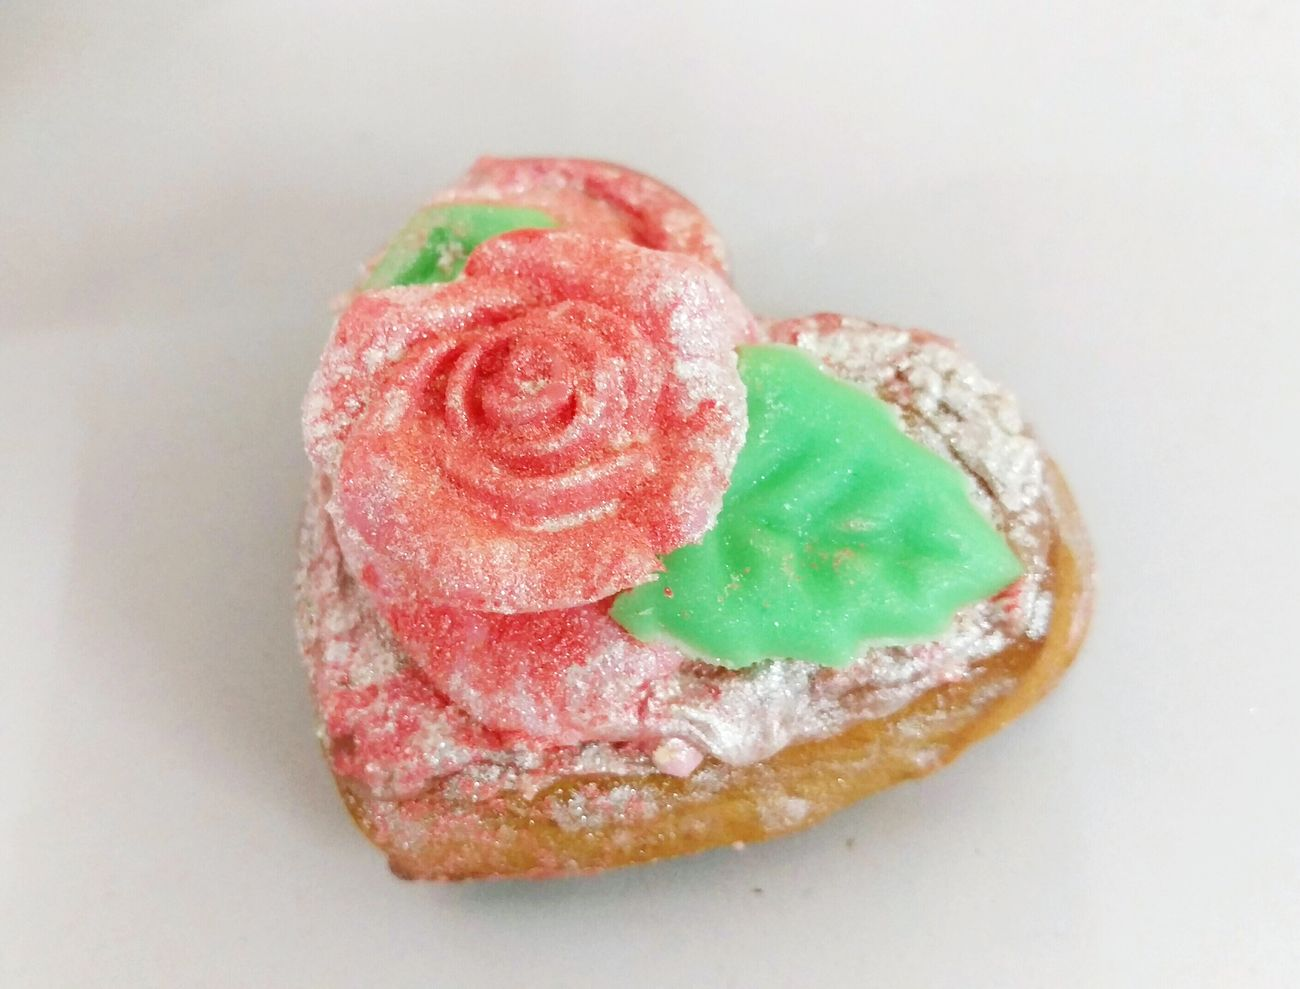 Lebkuchen Lebkuchenherz Check This Out Baking Dessert Selfmade Yummy Heart